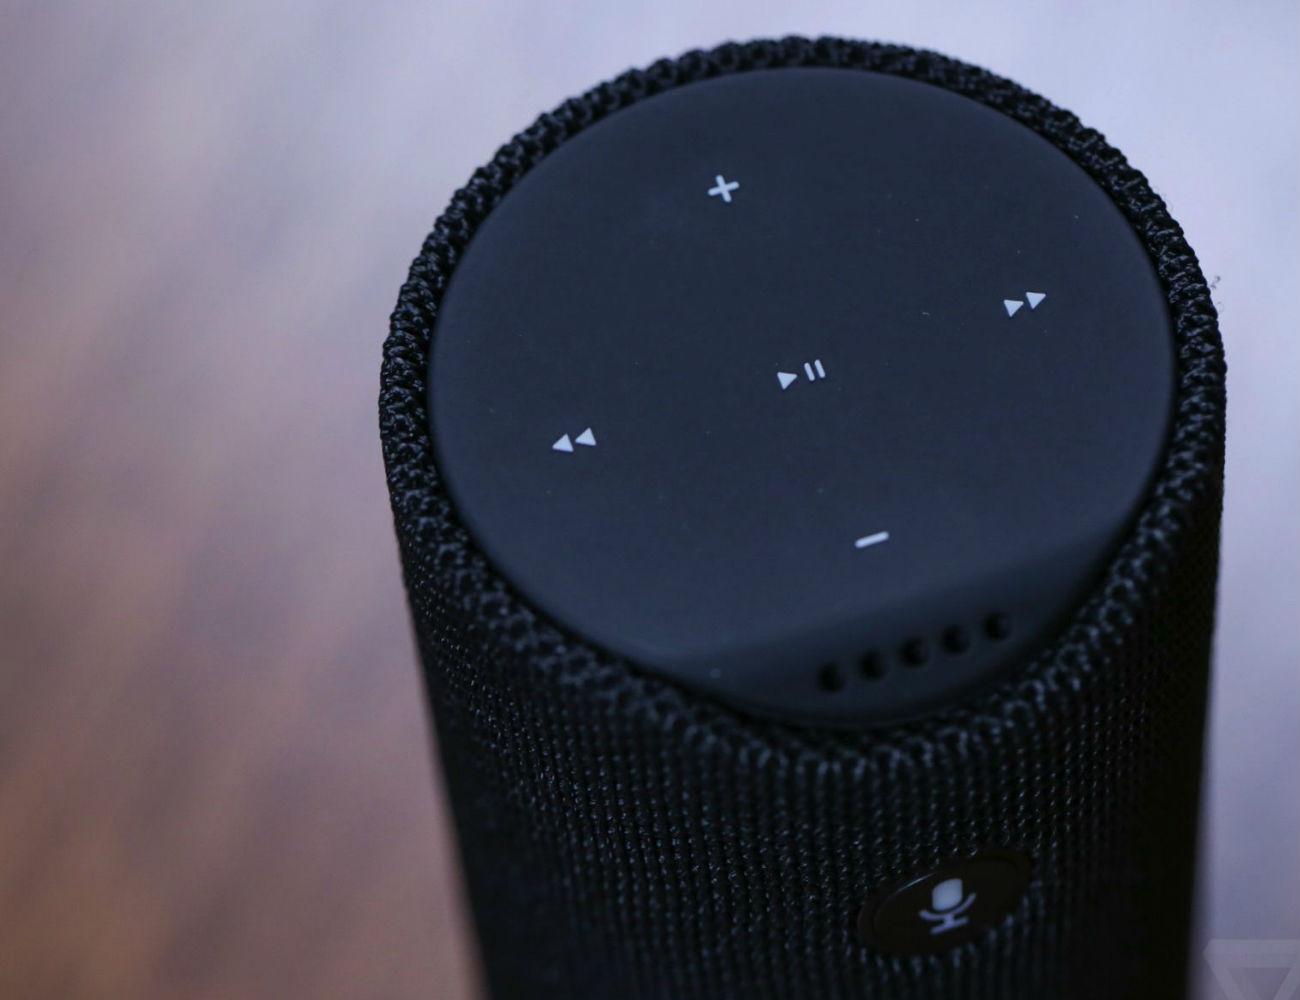 Amazon+Tap+Bluetooth+Speaker+With+Alexa